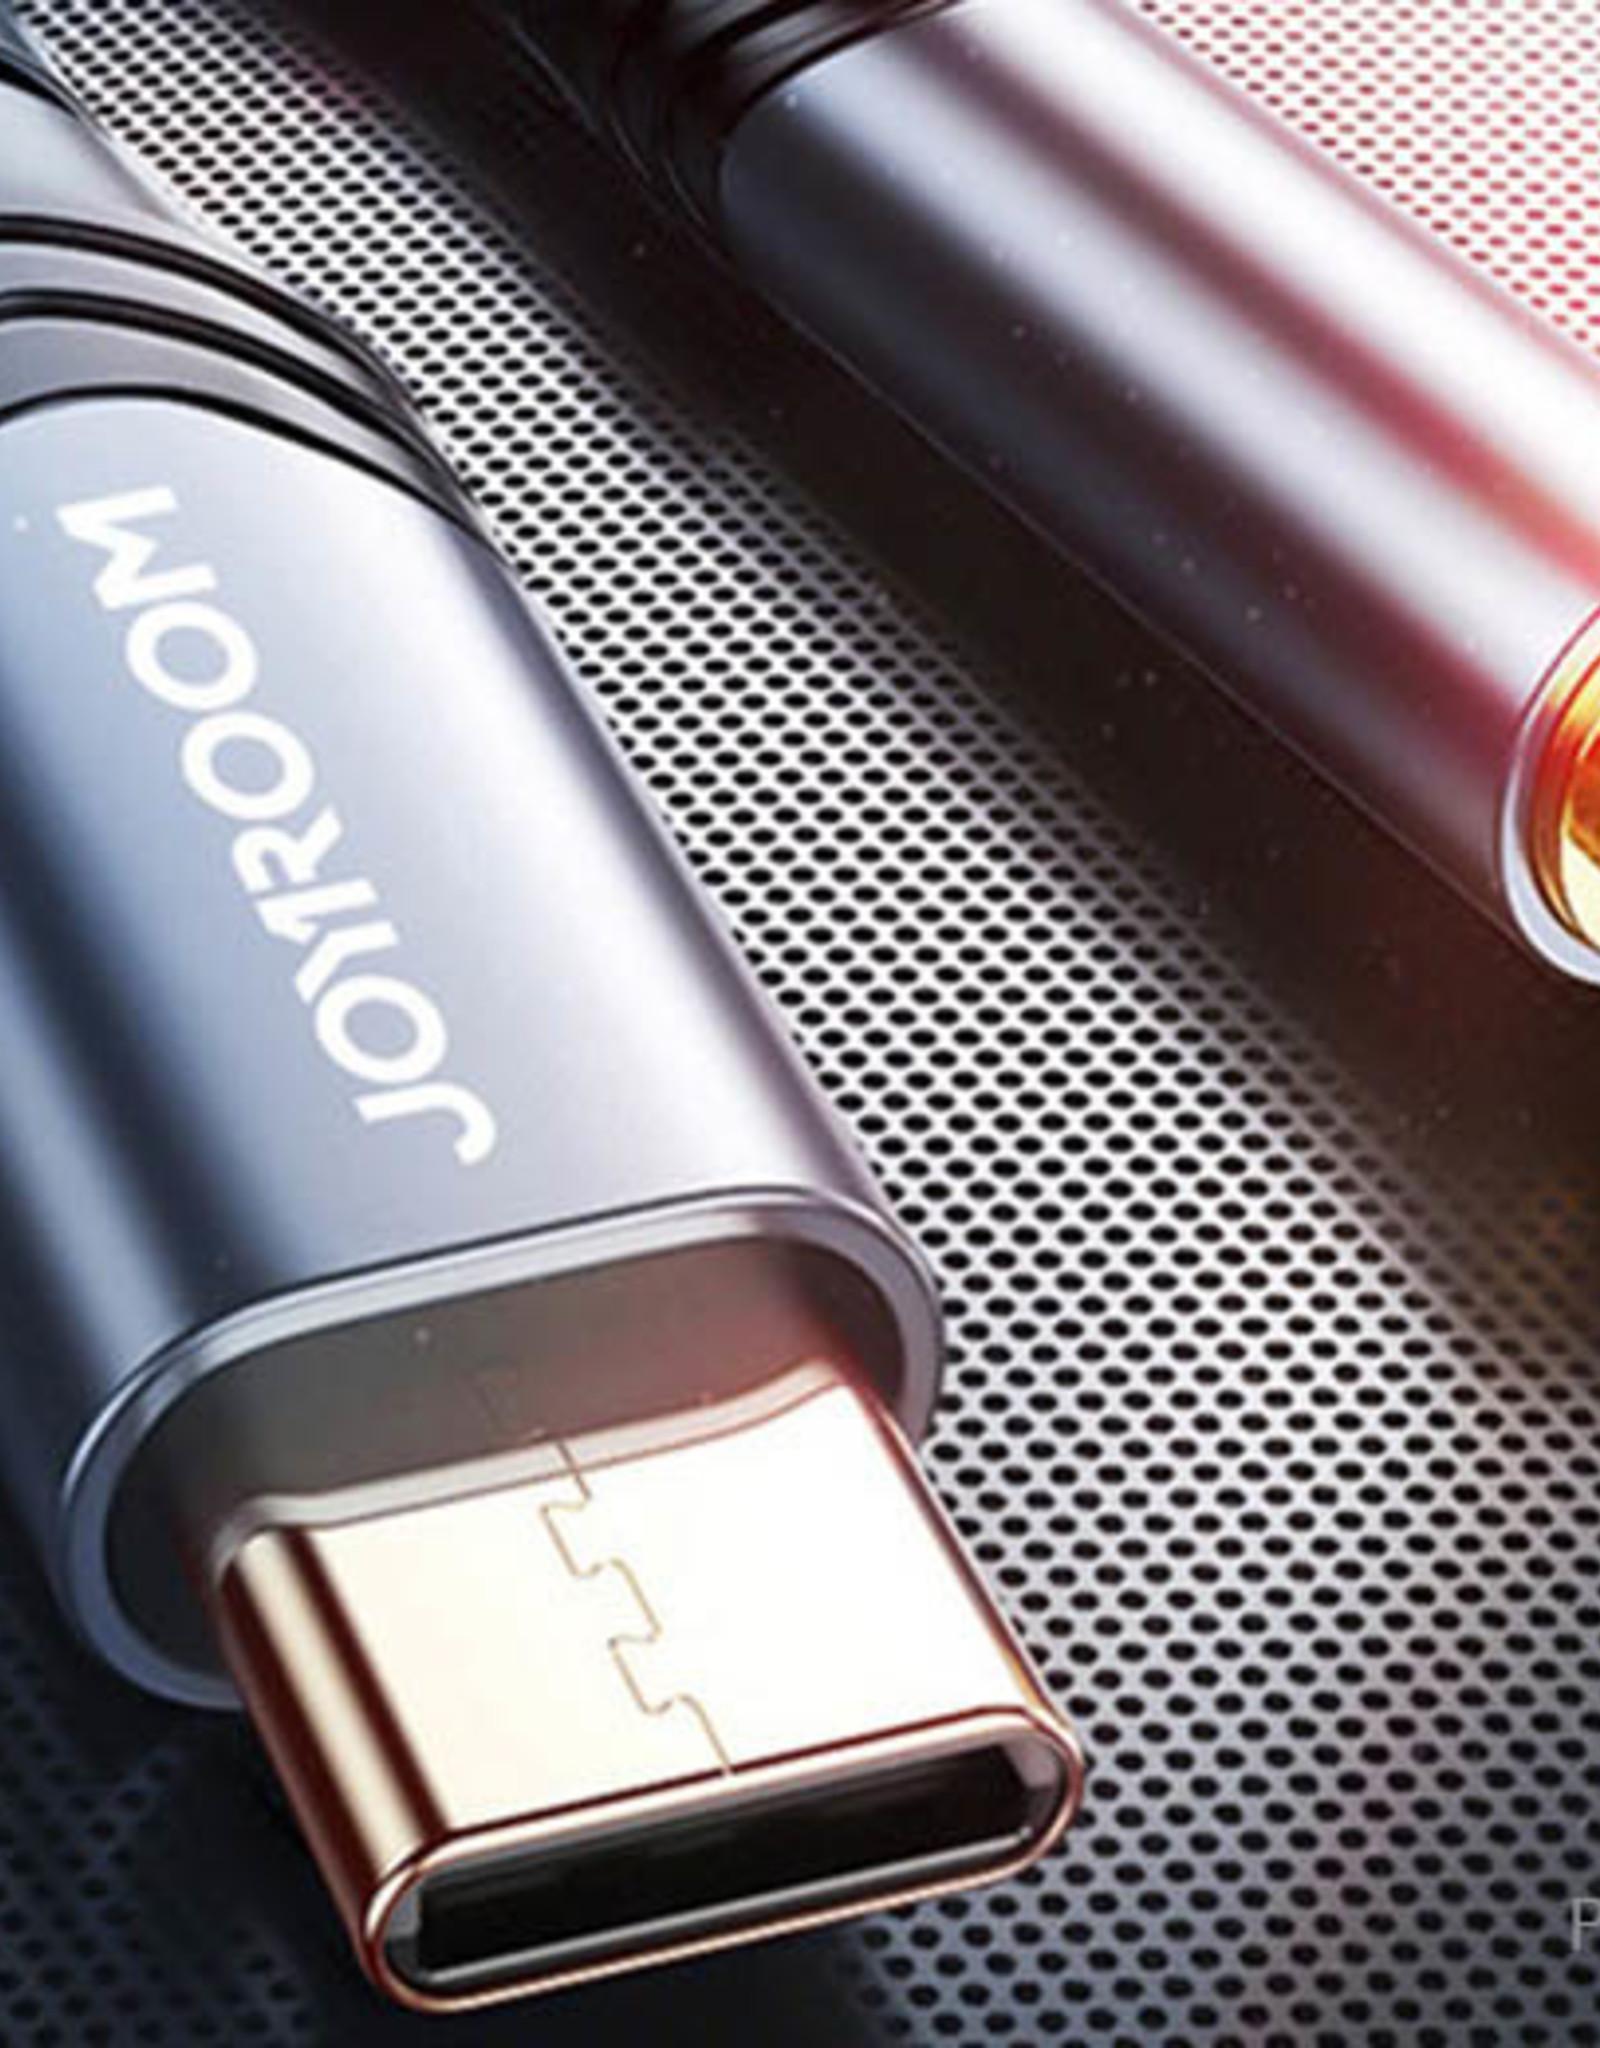 Joyroom Joyroom SY-A03 Universal USB-C to 3.5mm Audio Cable (200cm)(2m)